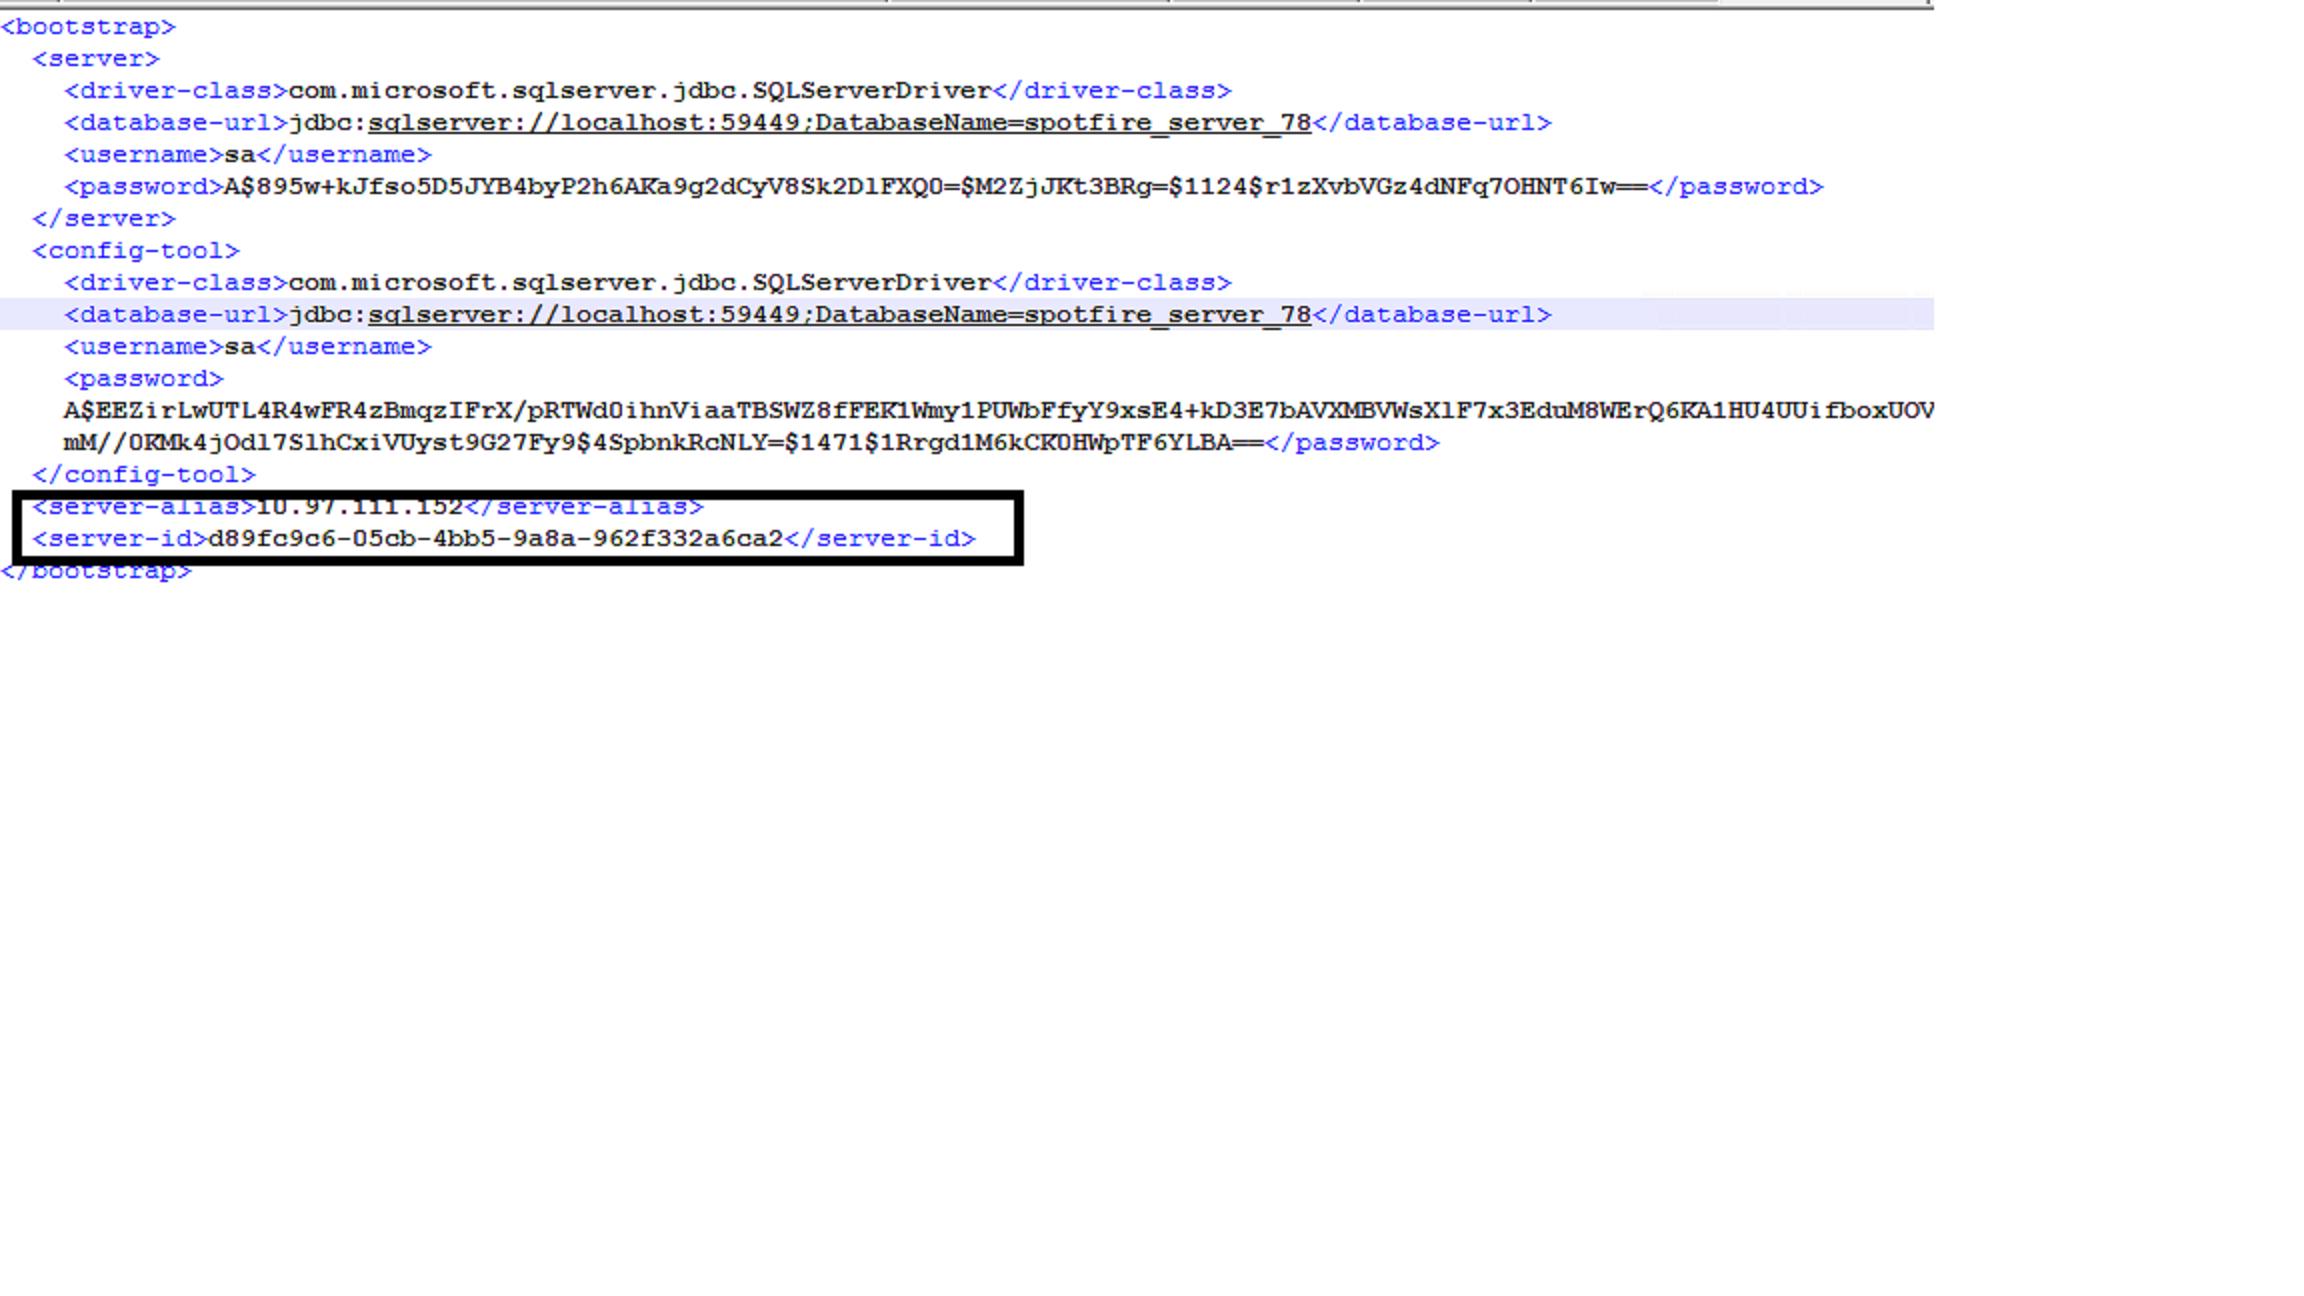 PerkinElmer Informatics Support FAQ: TIBCO Spotfire server fails to